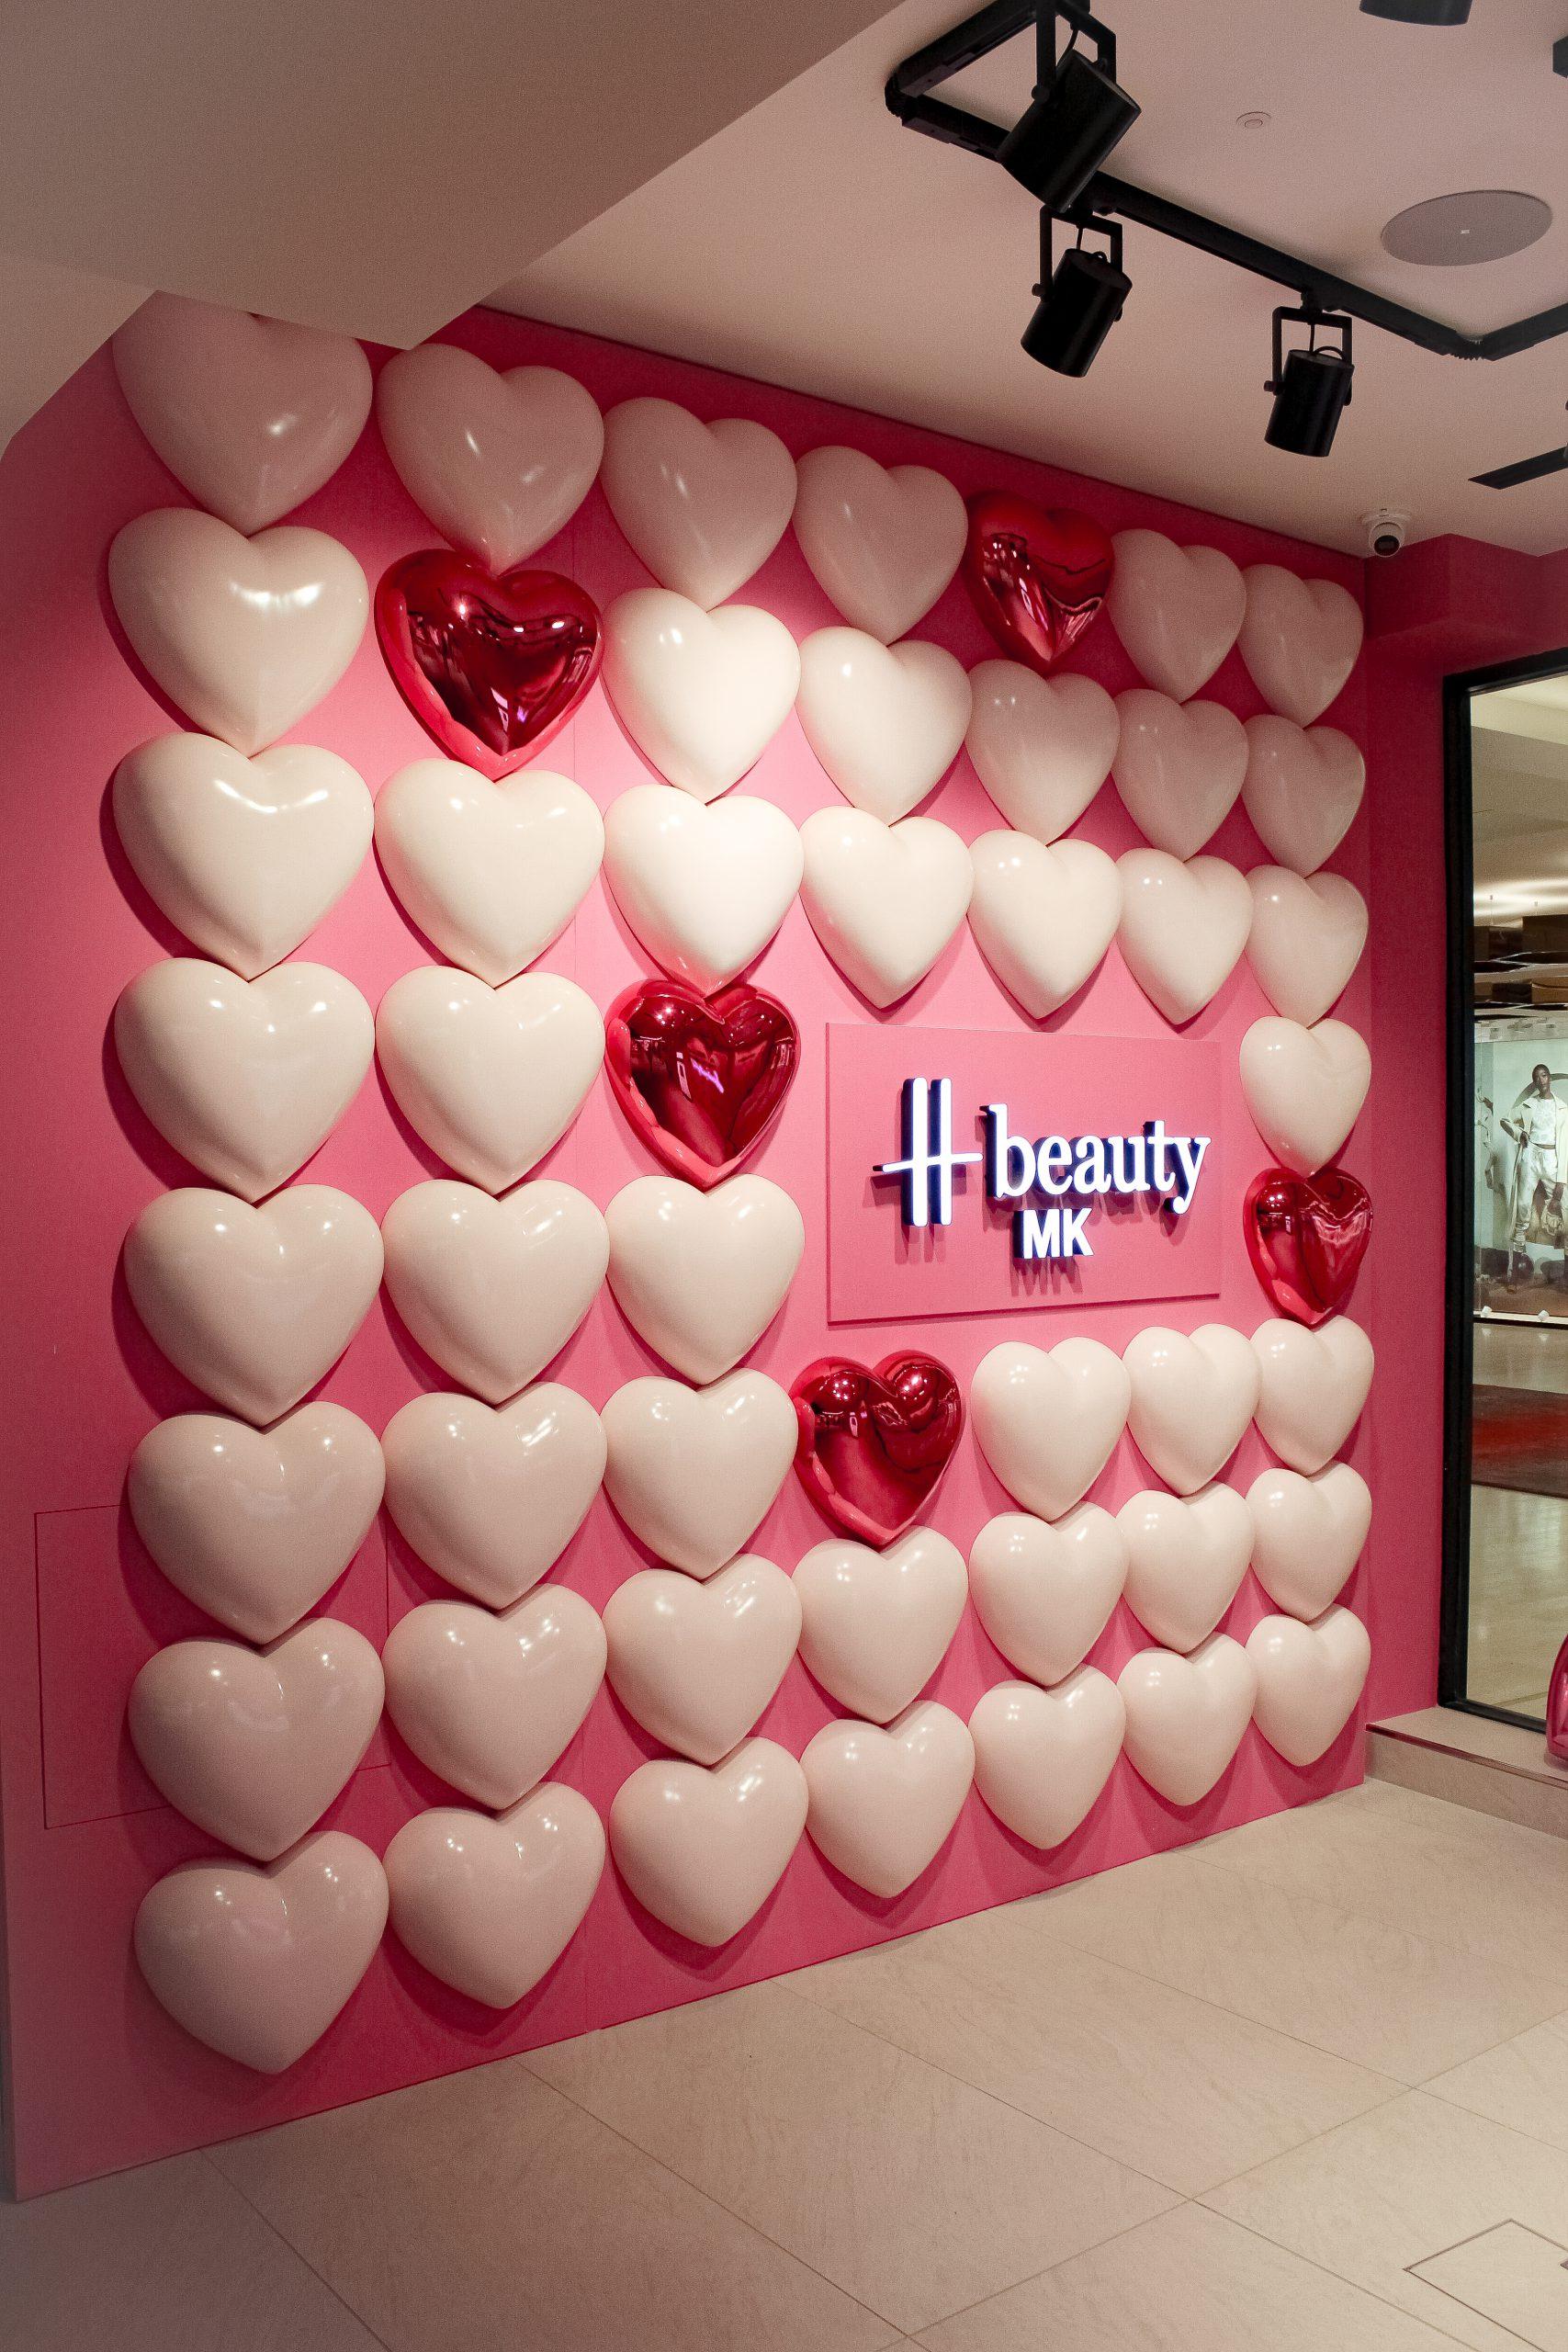 hbeauty-harrods-beauty-centre-miltonkeynes-pivotal-retail-blog